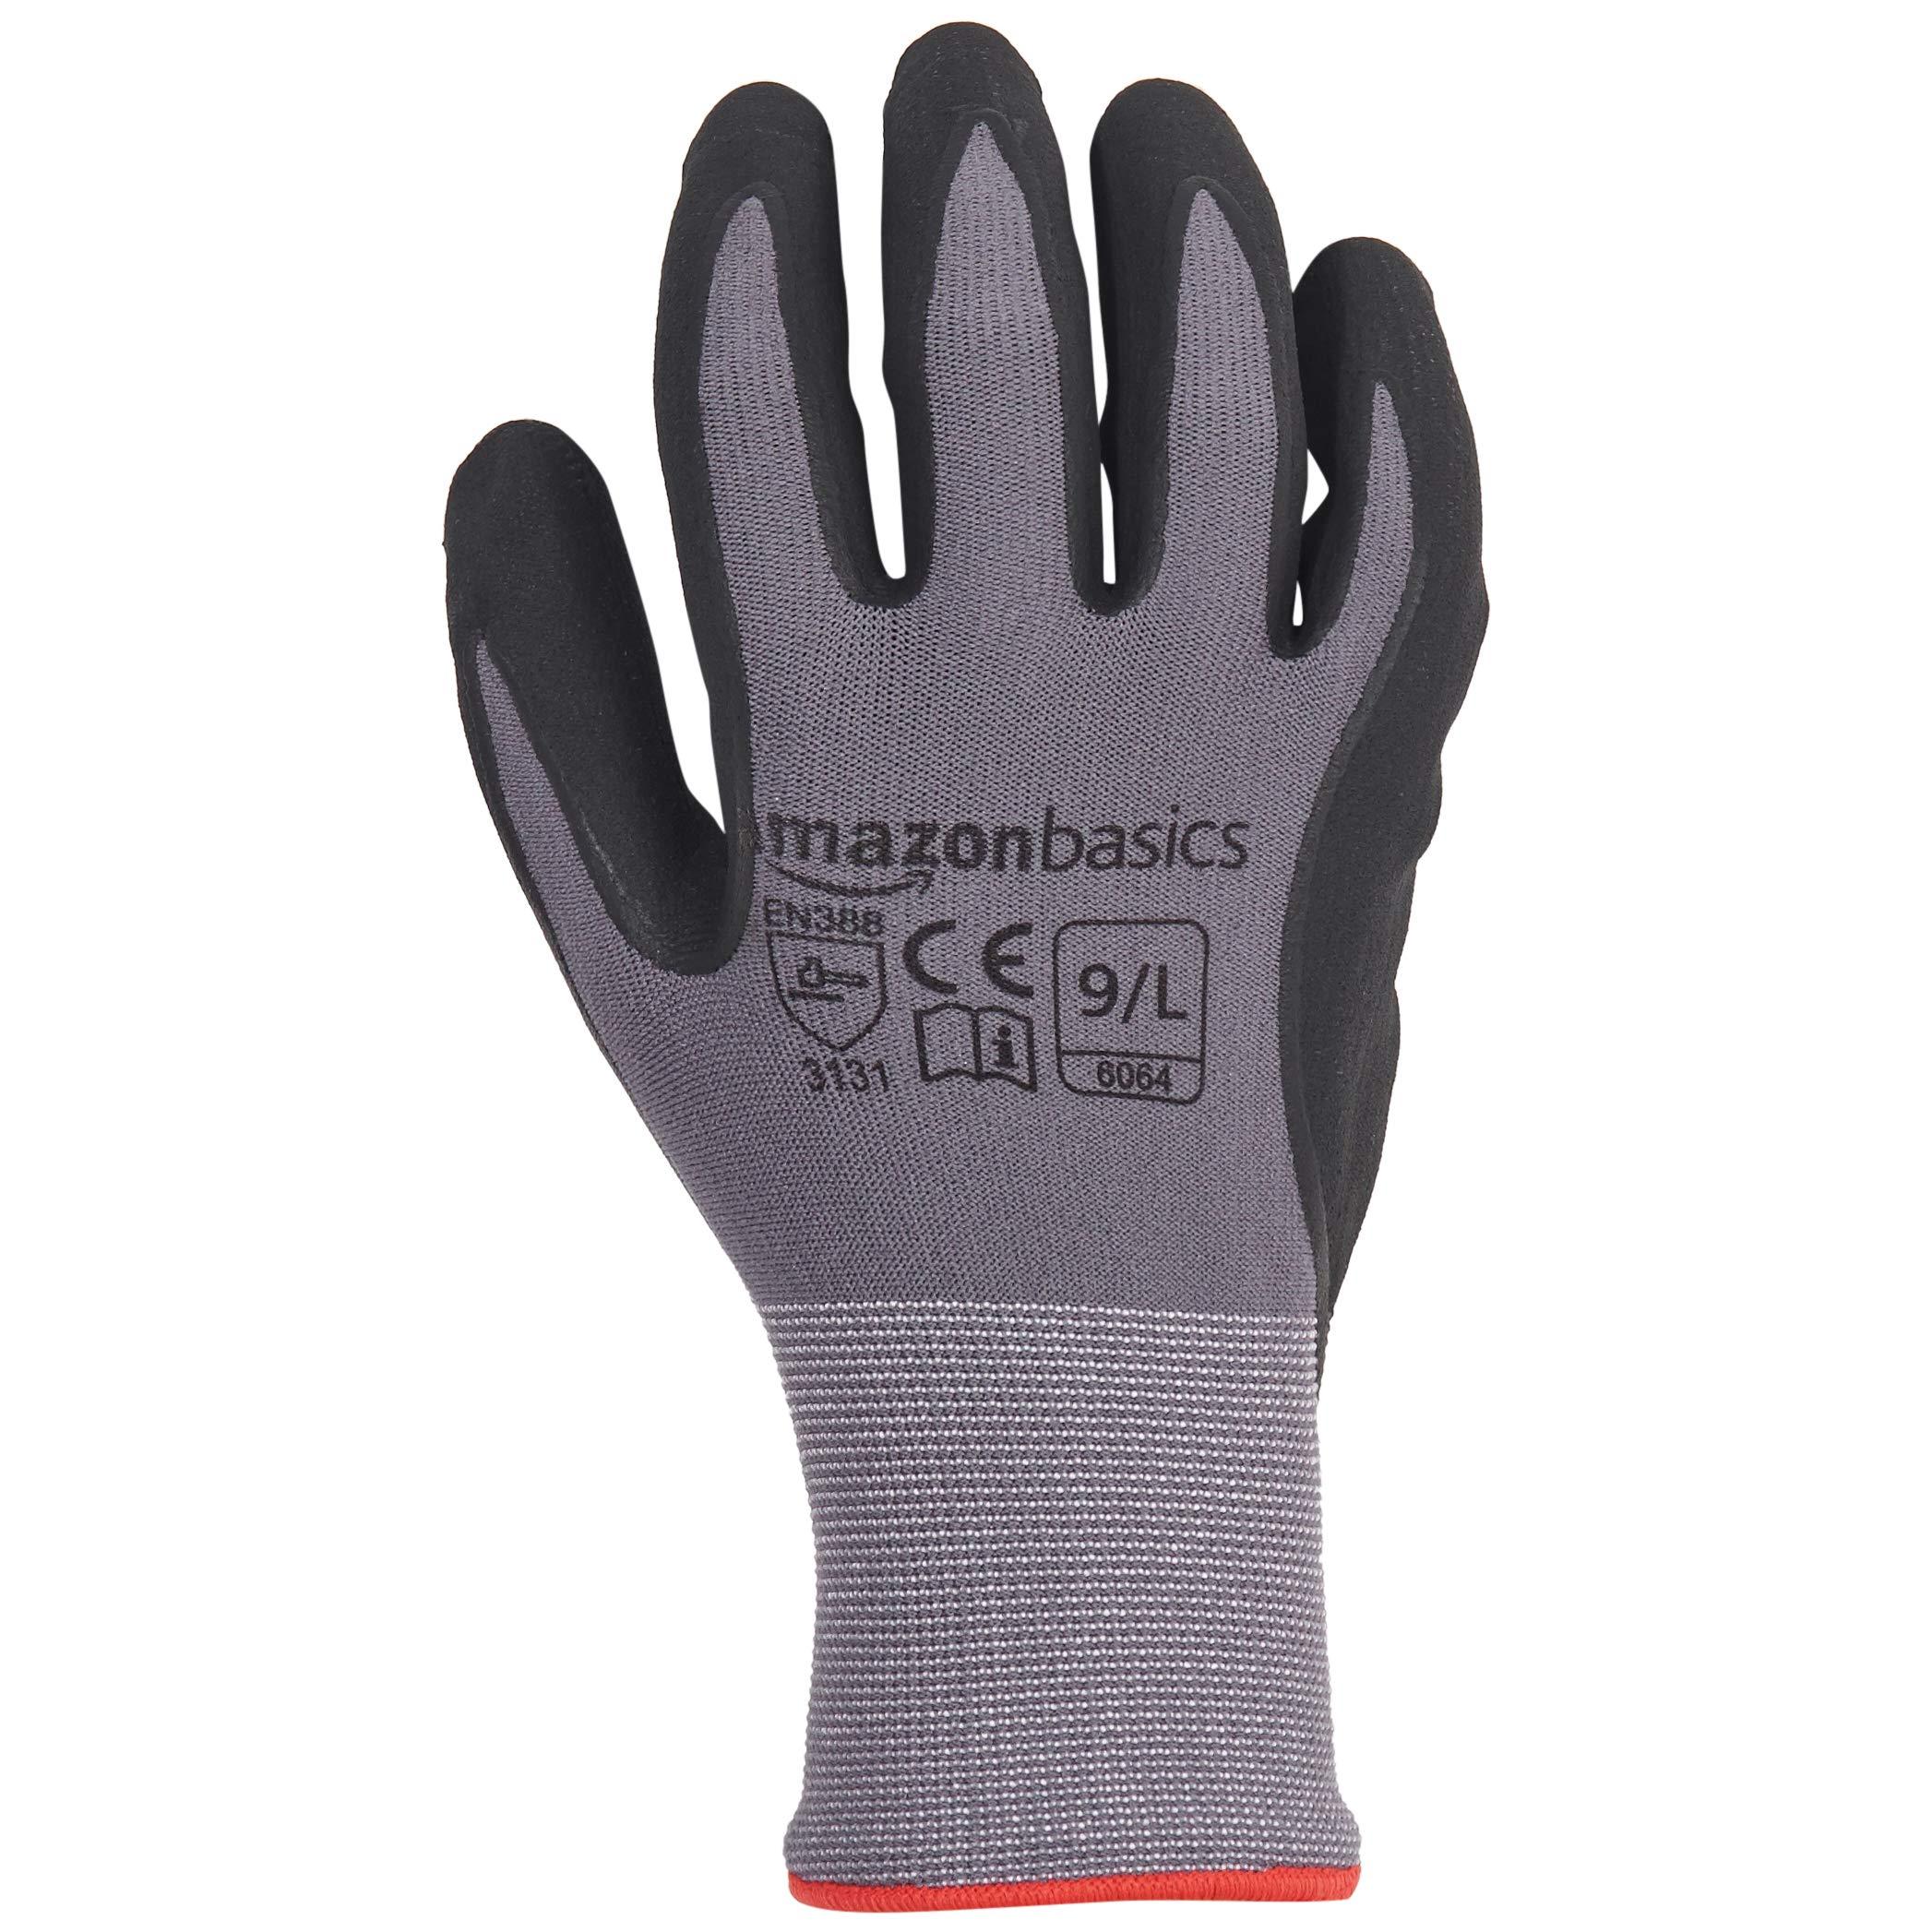 AmazonBasics Micro-Foam Nitrile Coated Work Gloves, Nylon Liner Fiber, Touch Screen, Grey, Size 9, L, 12-Pair by AmazonBasics (Image #4)